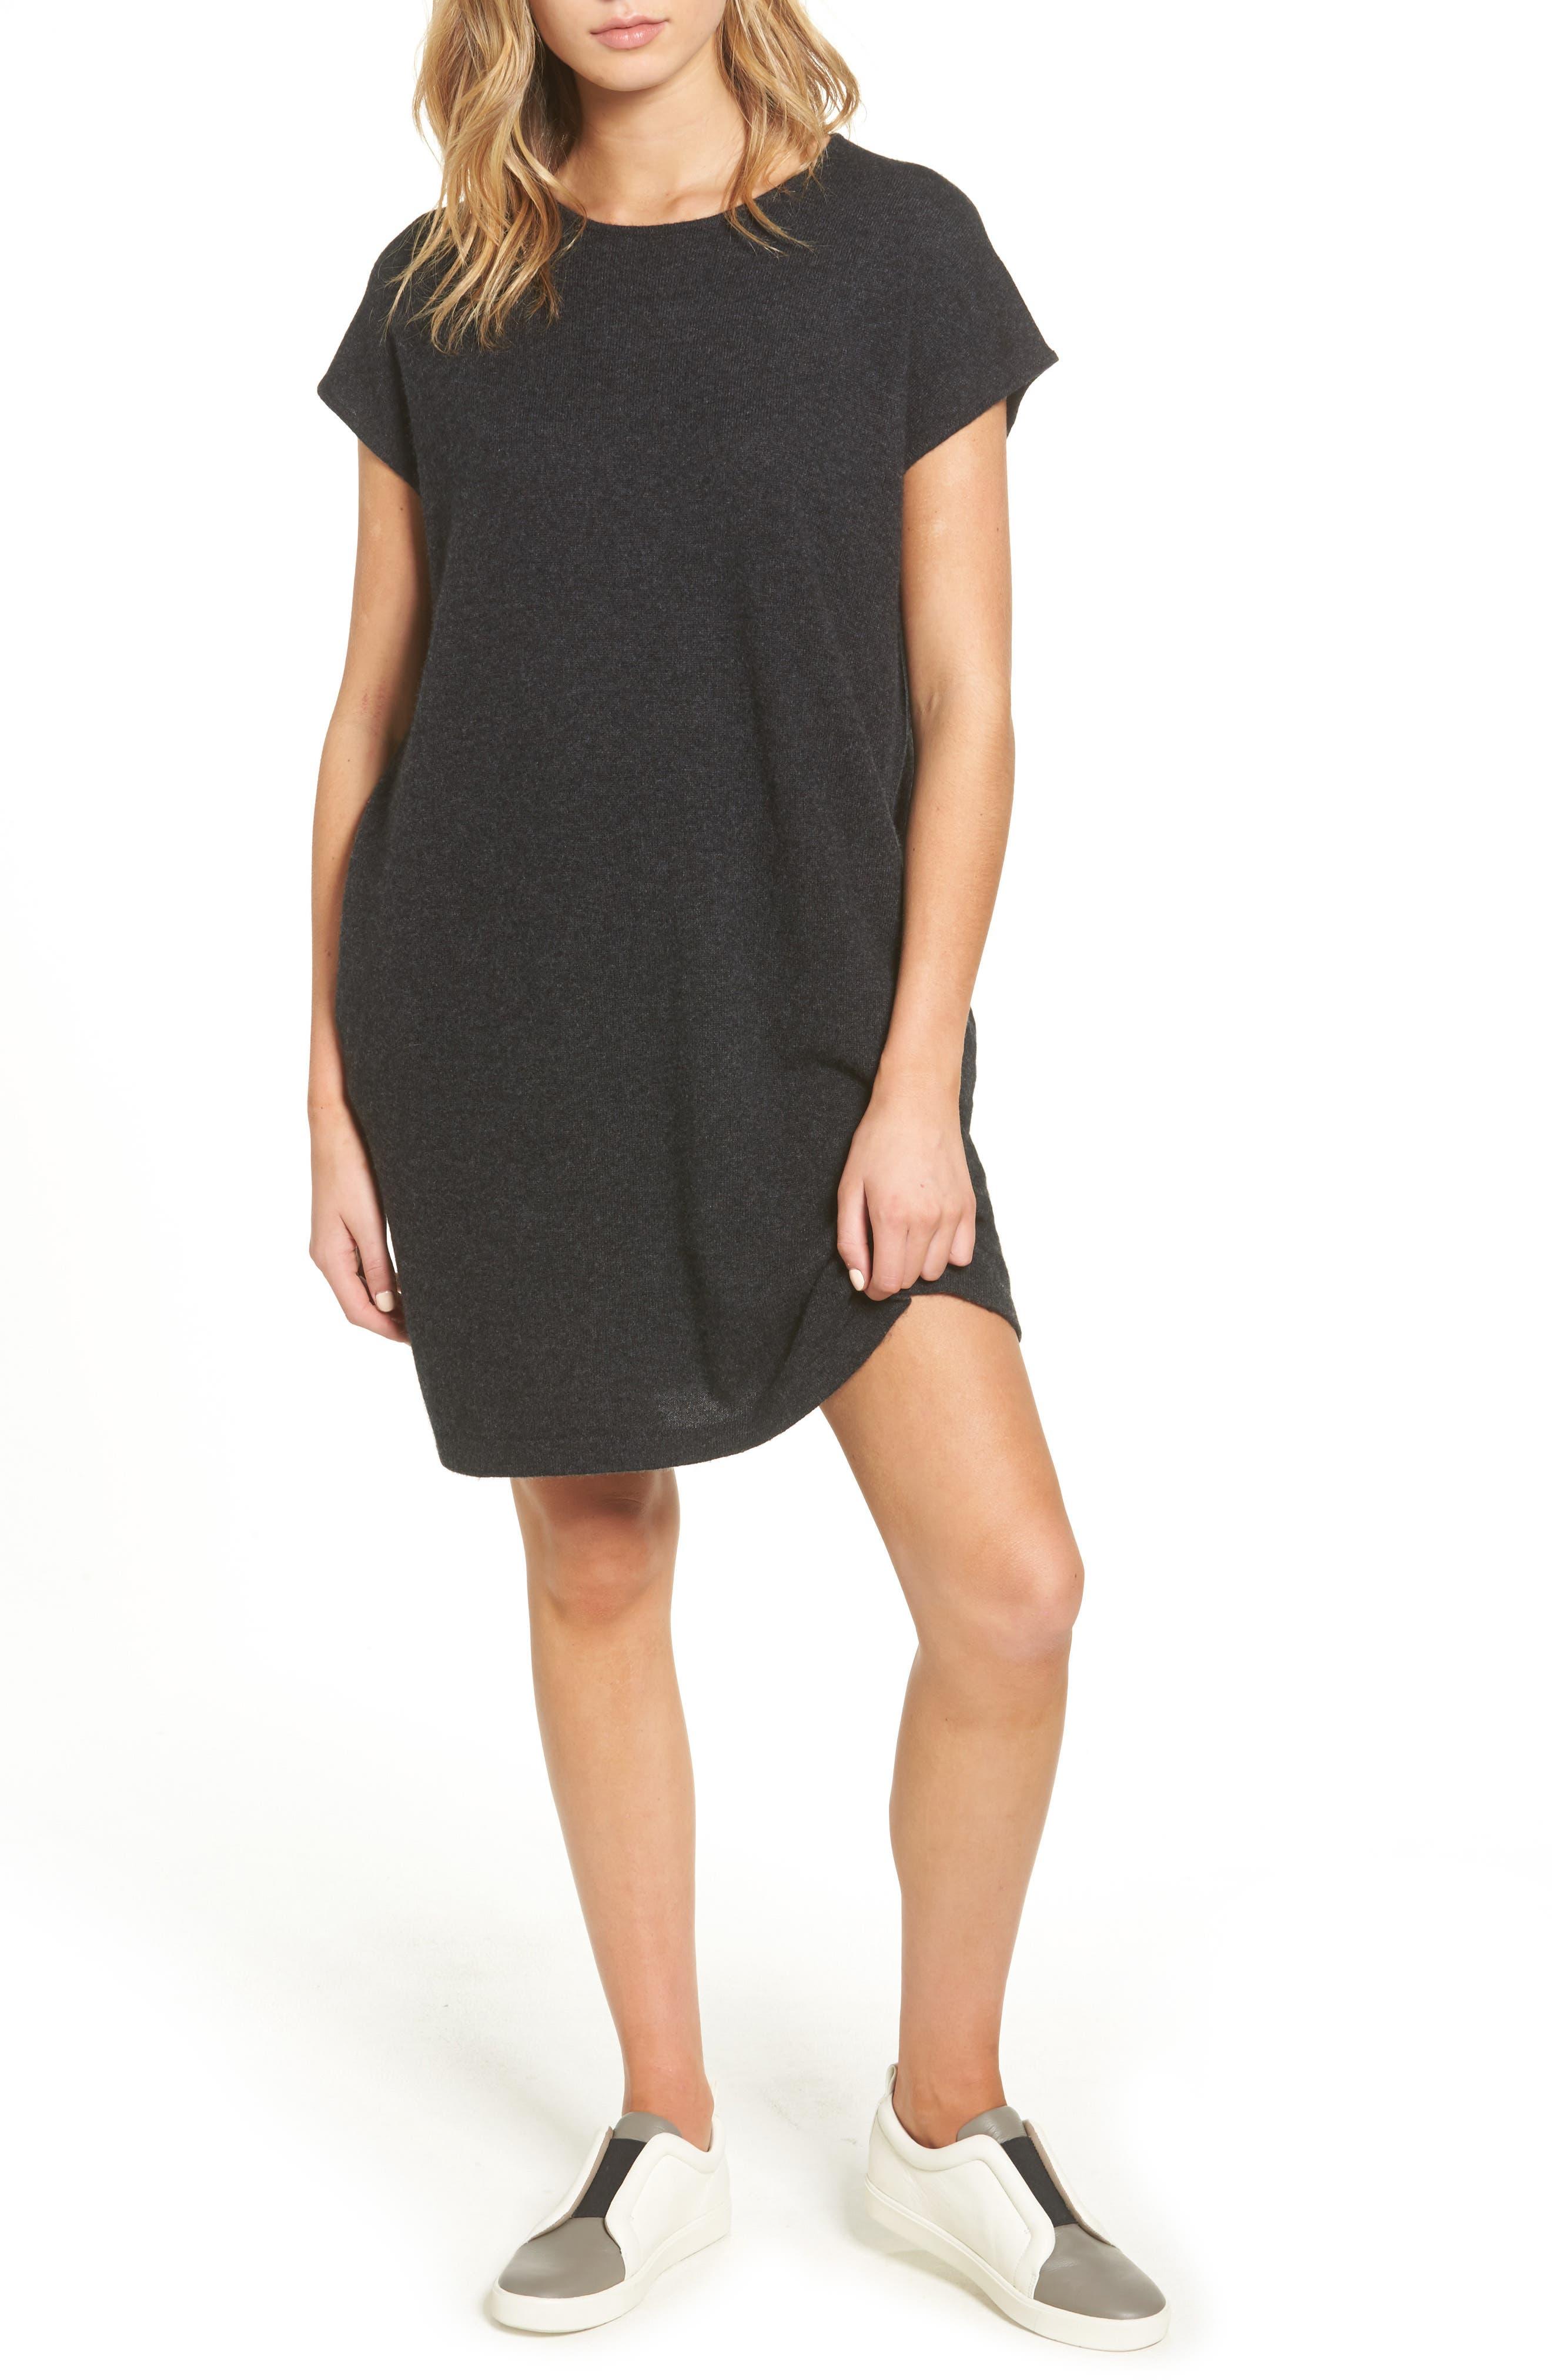 Main Image - James Perse Cashmere Tunic Sweater Dress